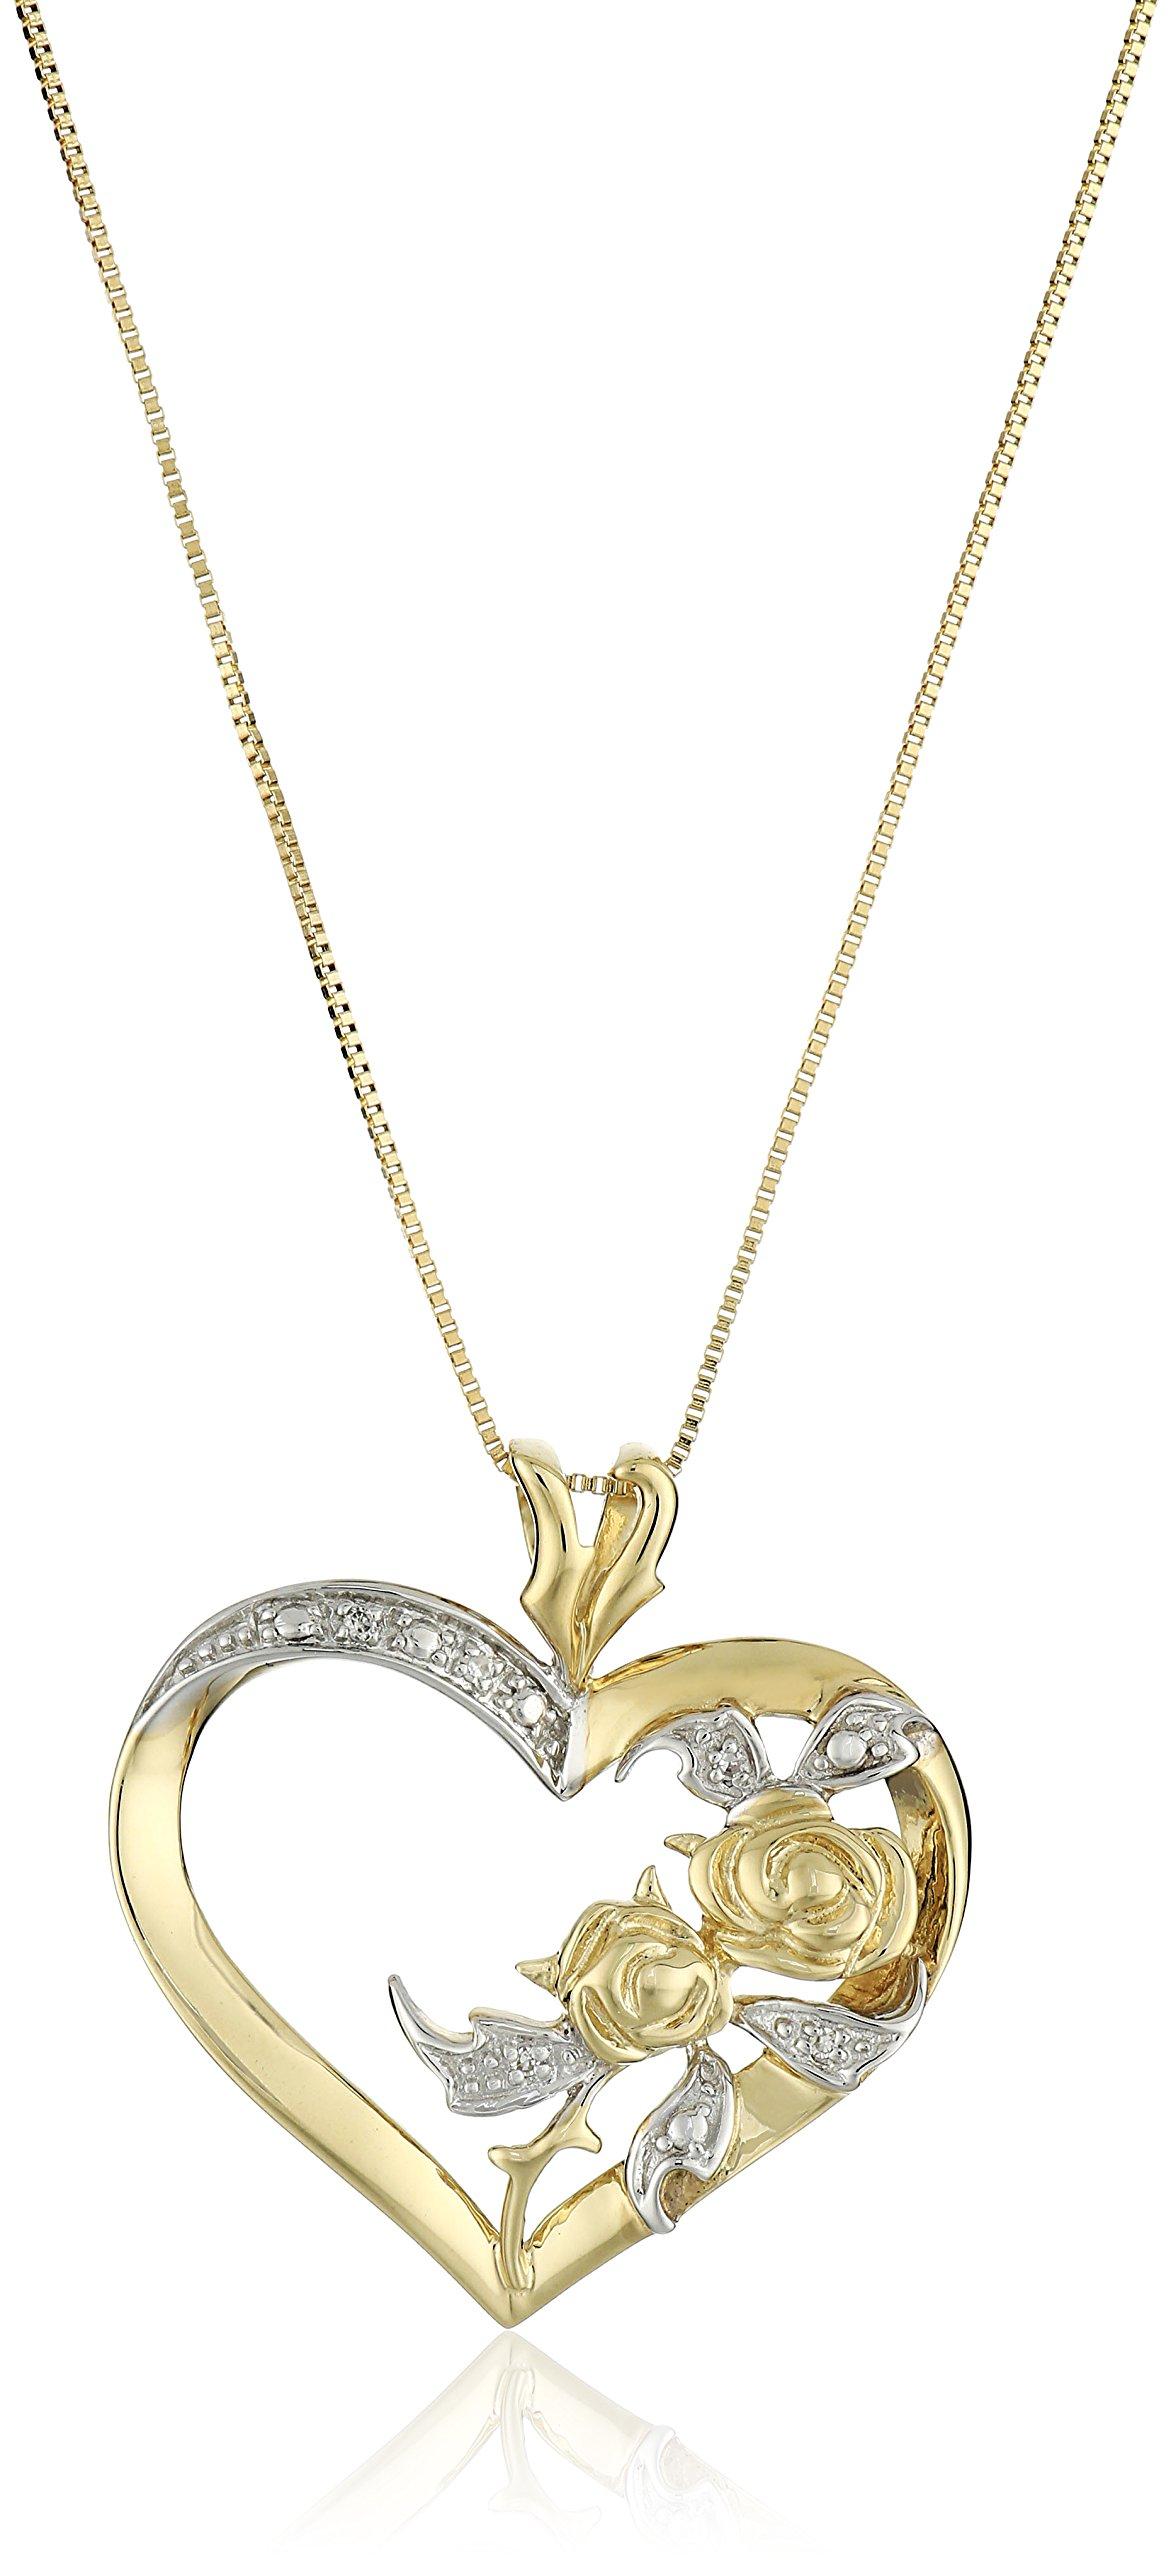 10k Yellow Gold Diamond Accent Heart Pendant Necklace, 18''